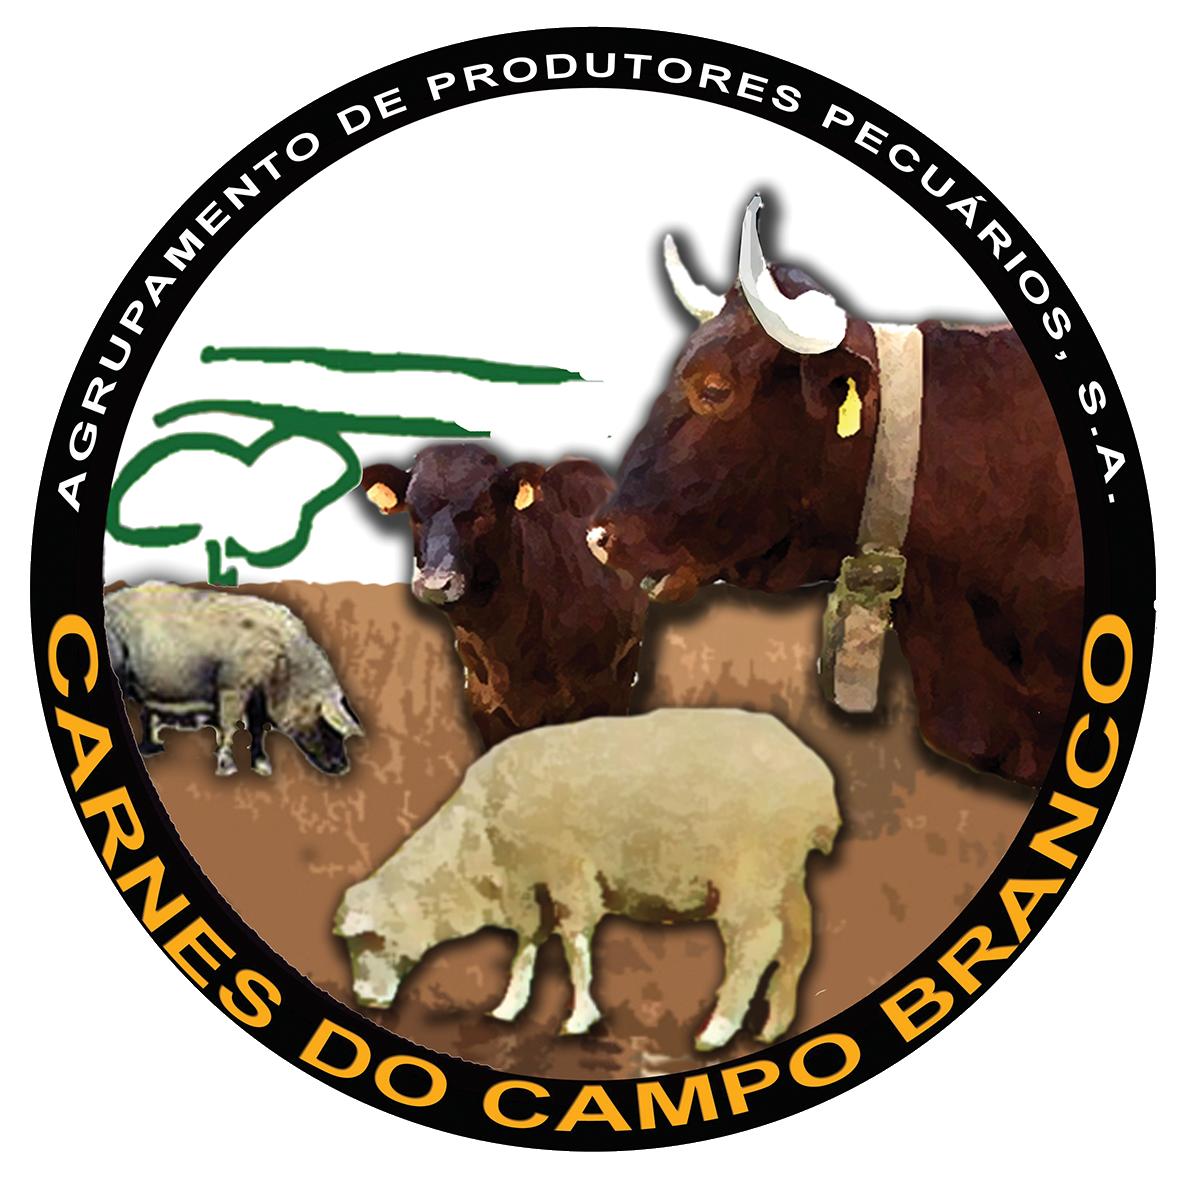 Carnes do Campo Branco